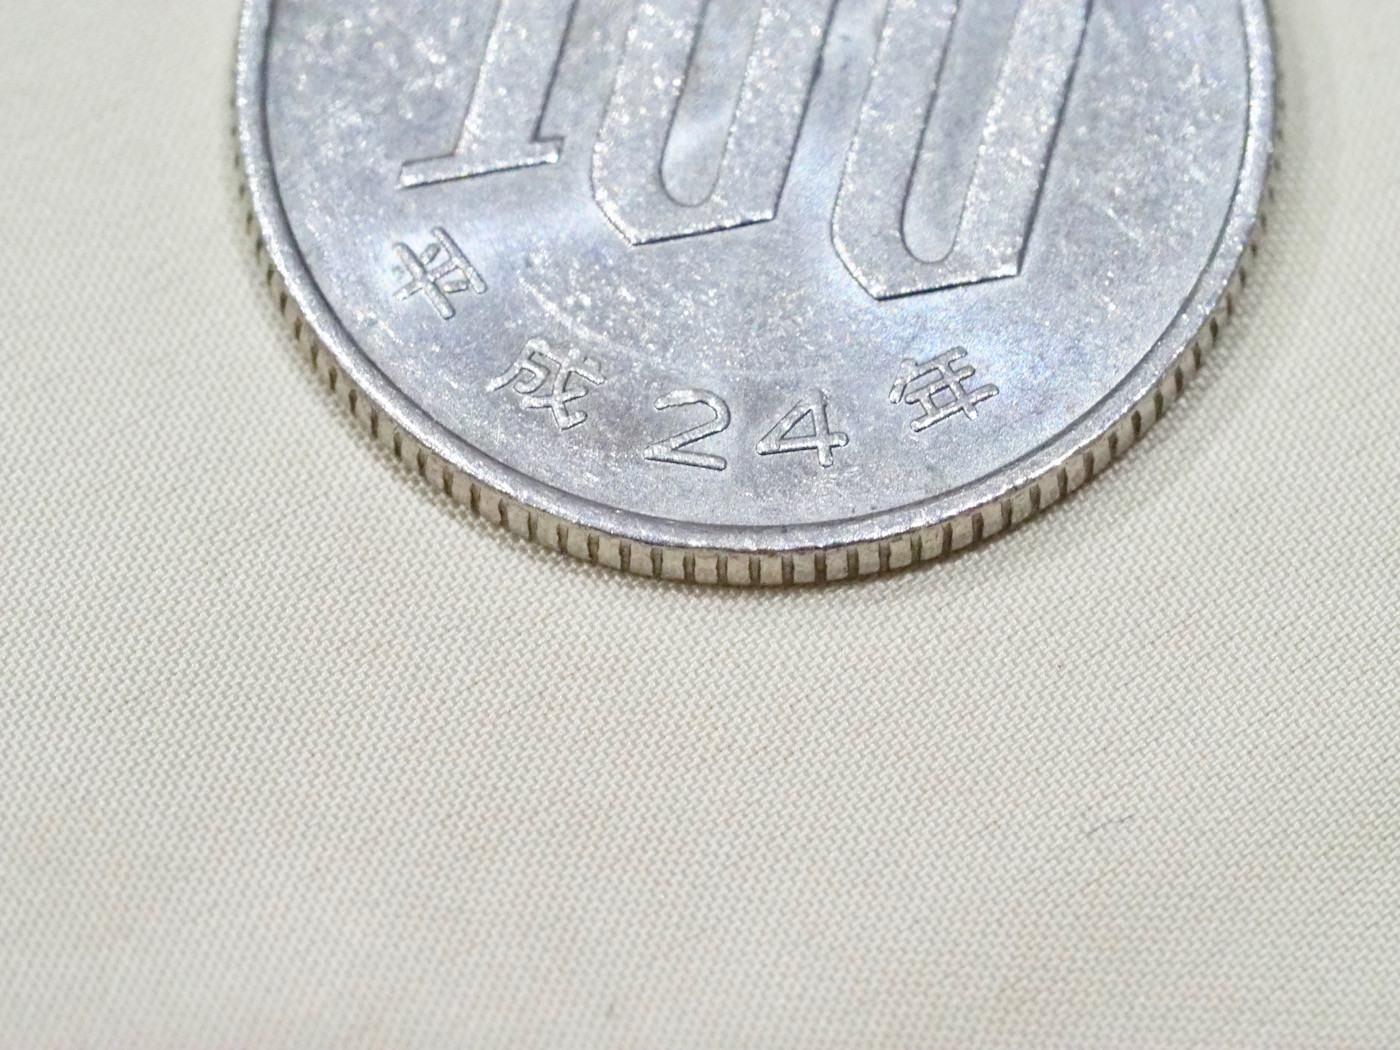 Teijin micro silstar 0024